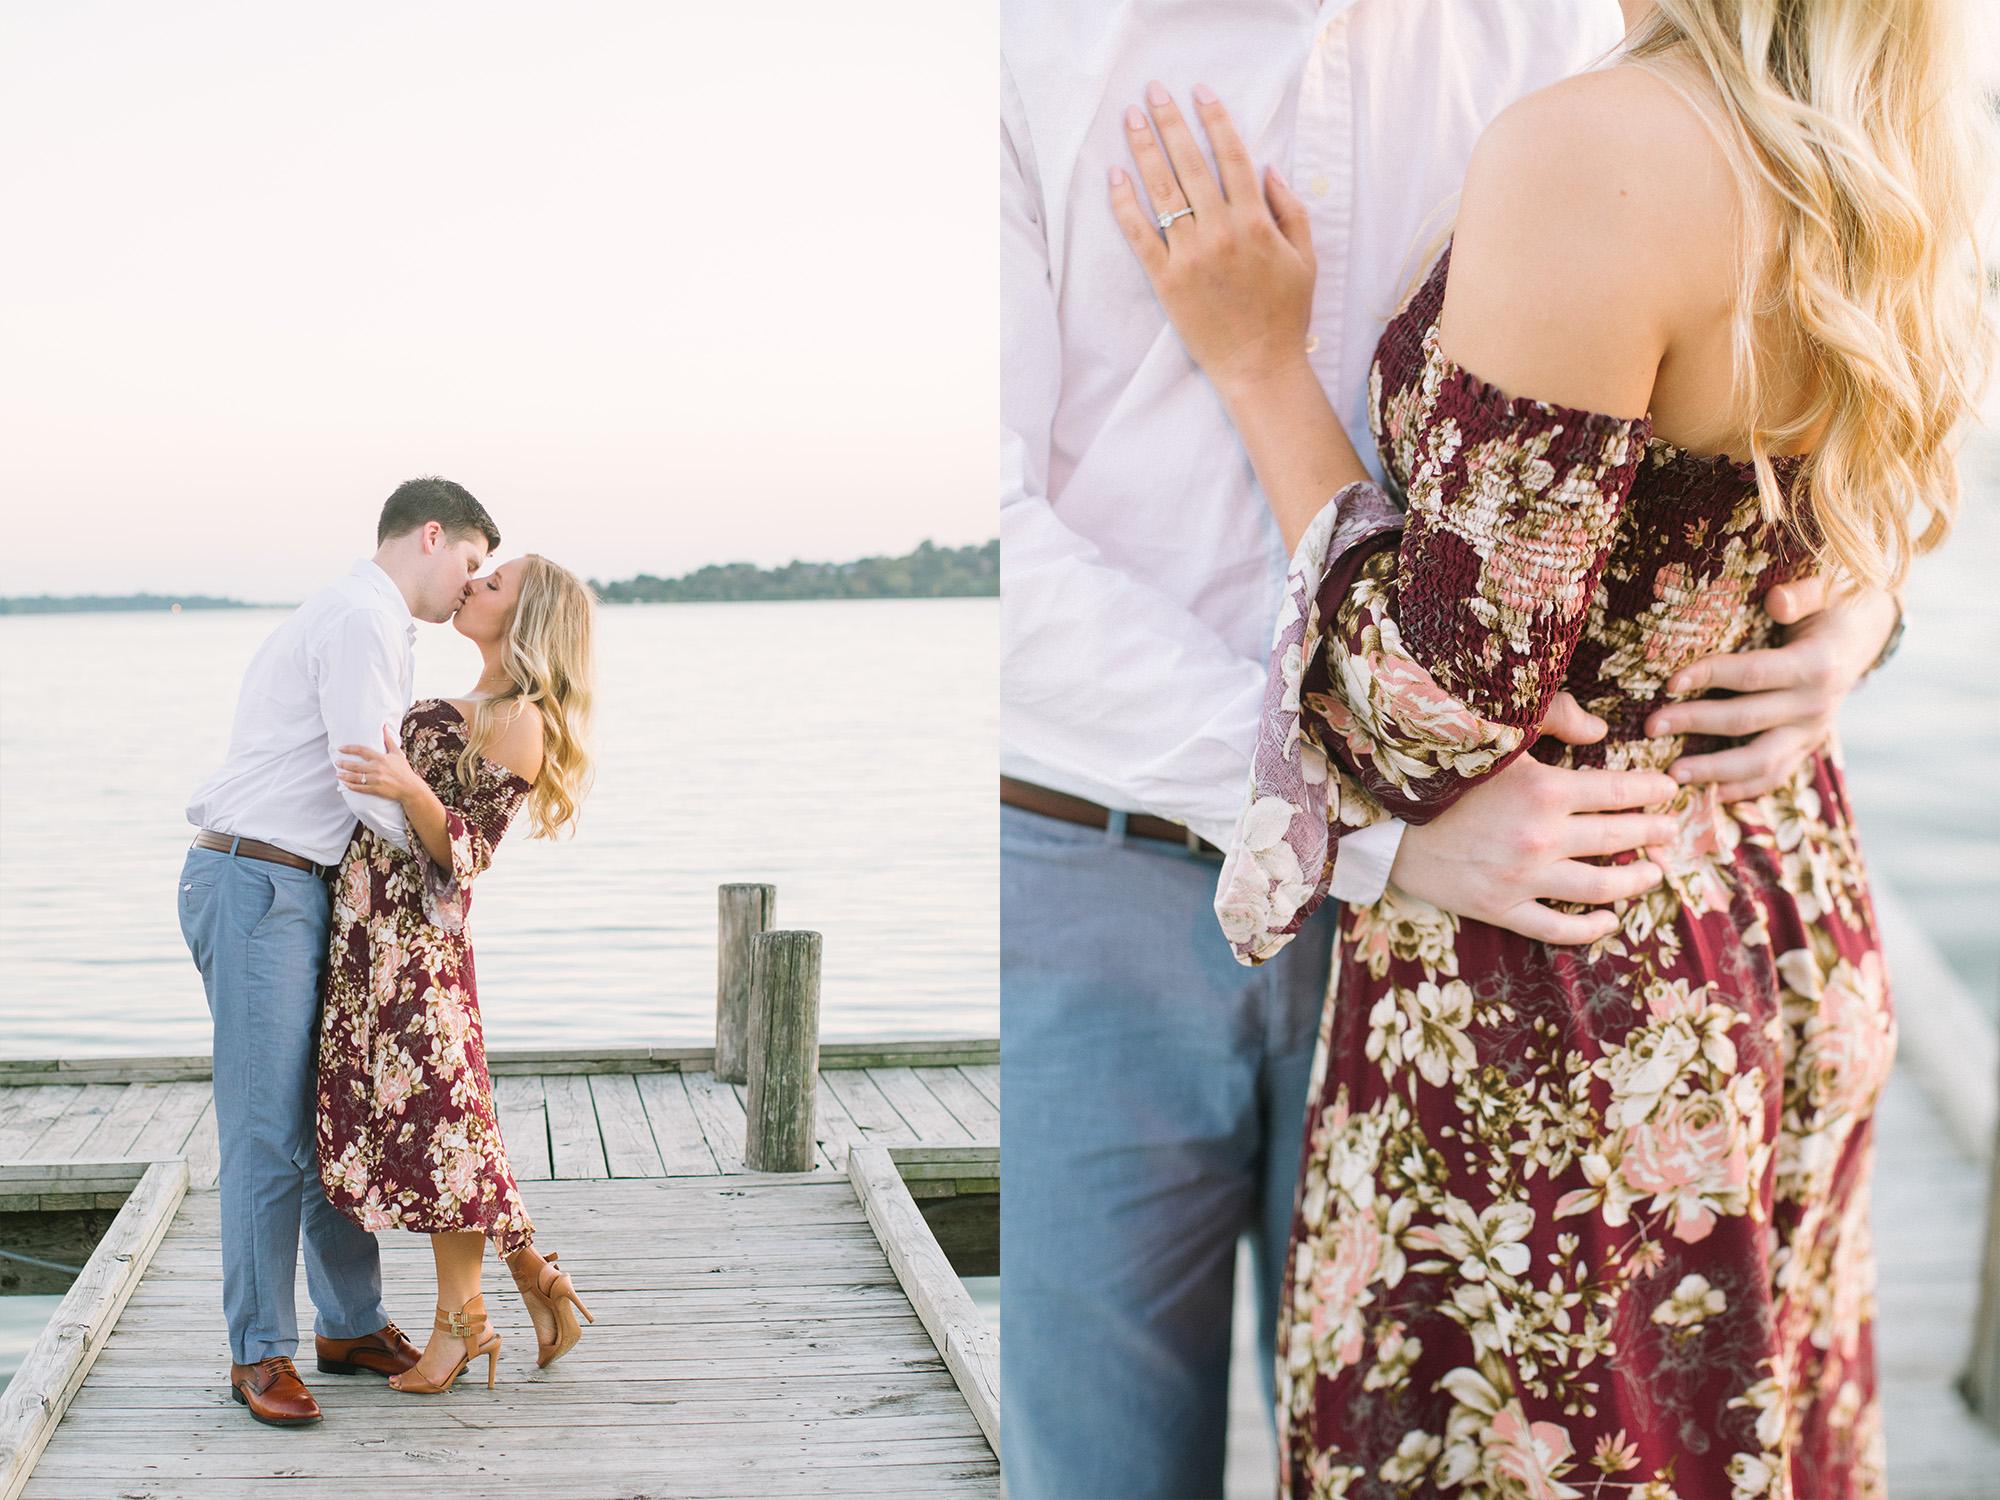 Ellen-Ashton-Photography-Dallas-Wedding-Photographers-Ivory-and-Vine-Events-Dallas-Wedding-Planners-Destination-Wedding-Photographers17.jpg